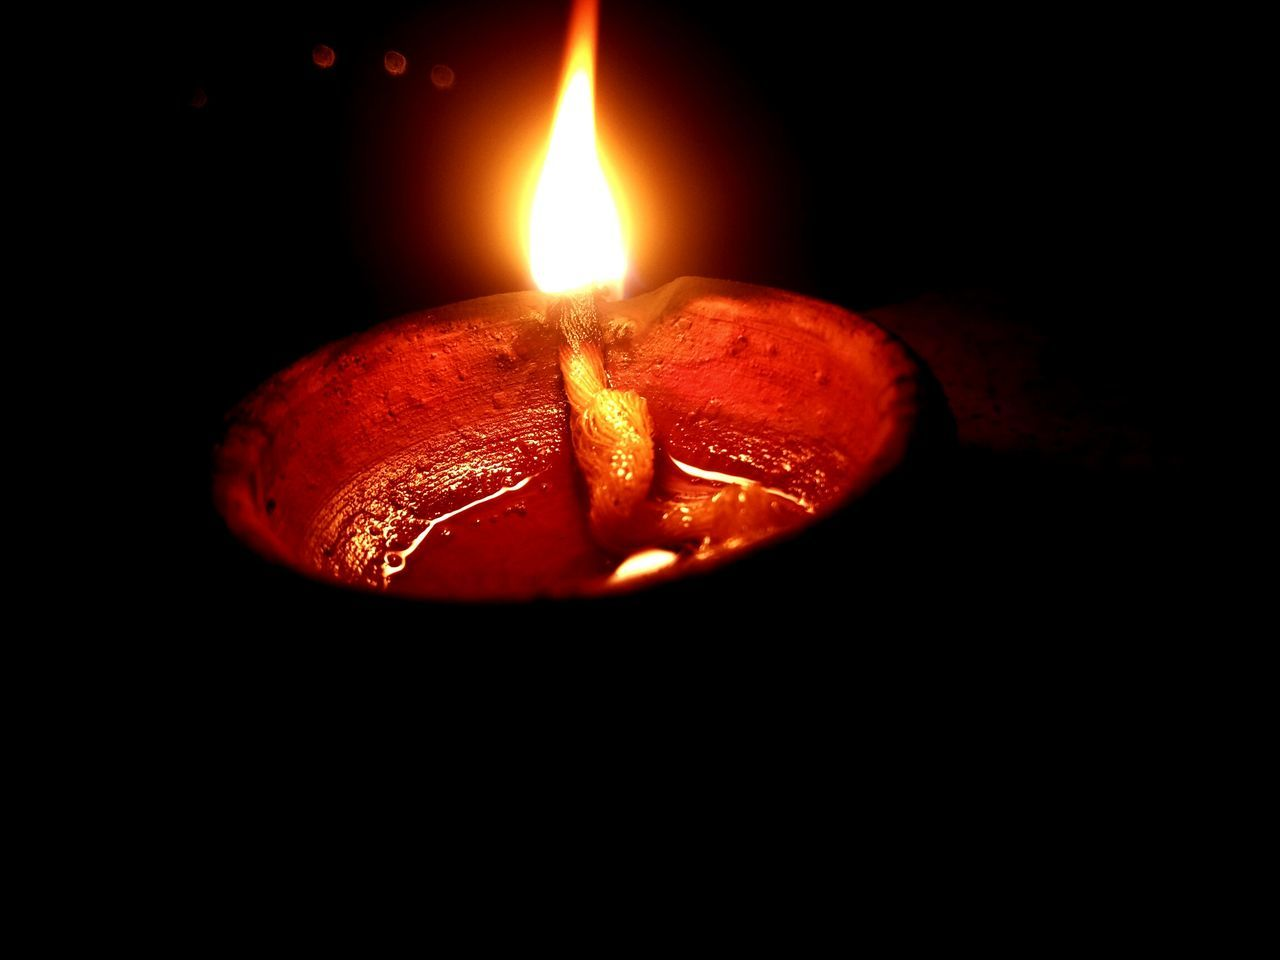 Hinduism Diya Light In The Darkness Diwalitime Diwali Celebration 🌟💥🔥